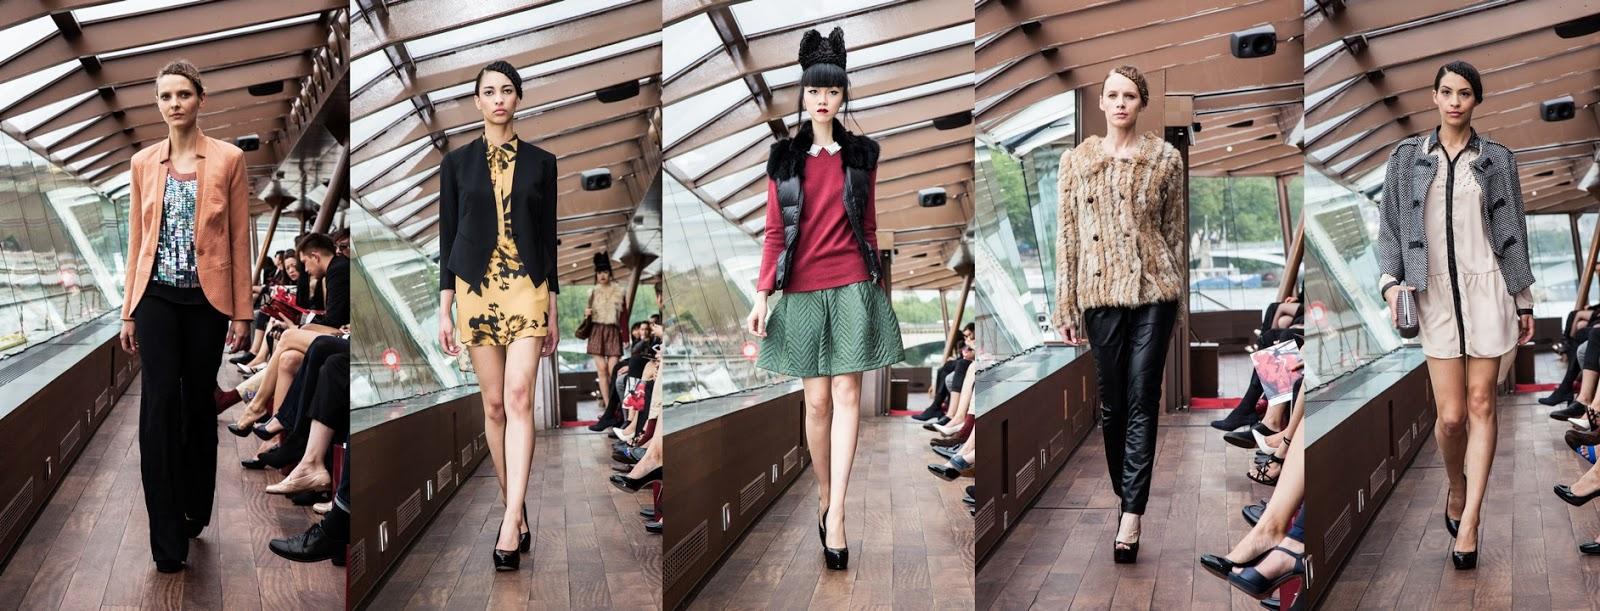 WTFSG-j-summer-fashion-show-on-river-seine-paris-8